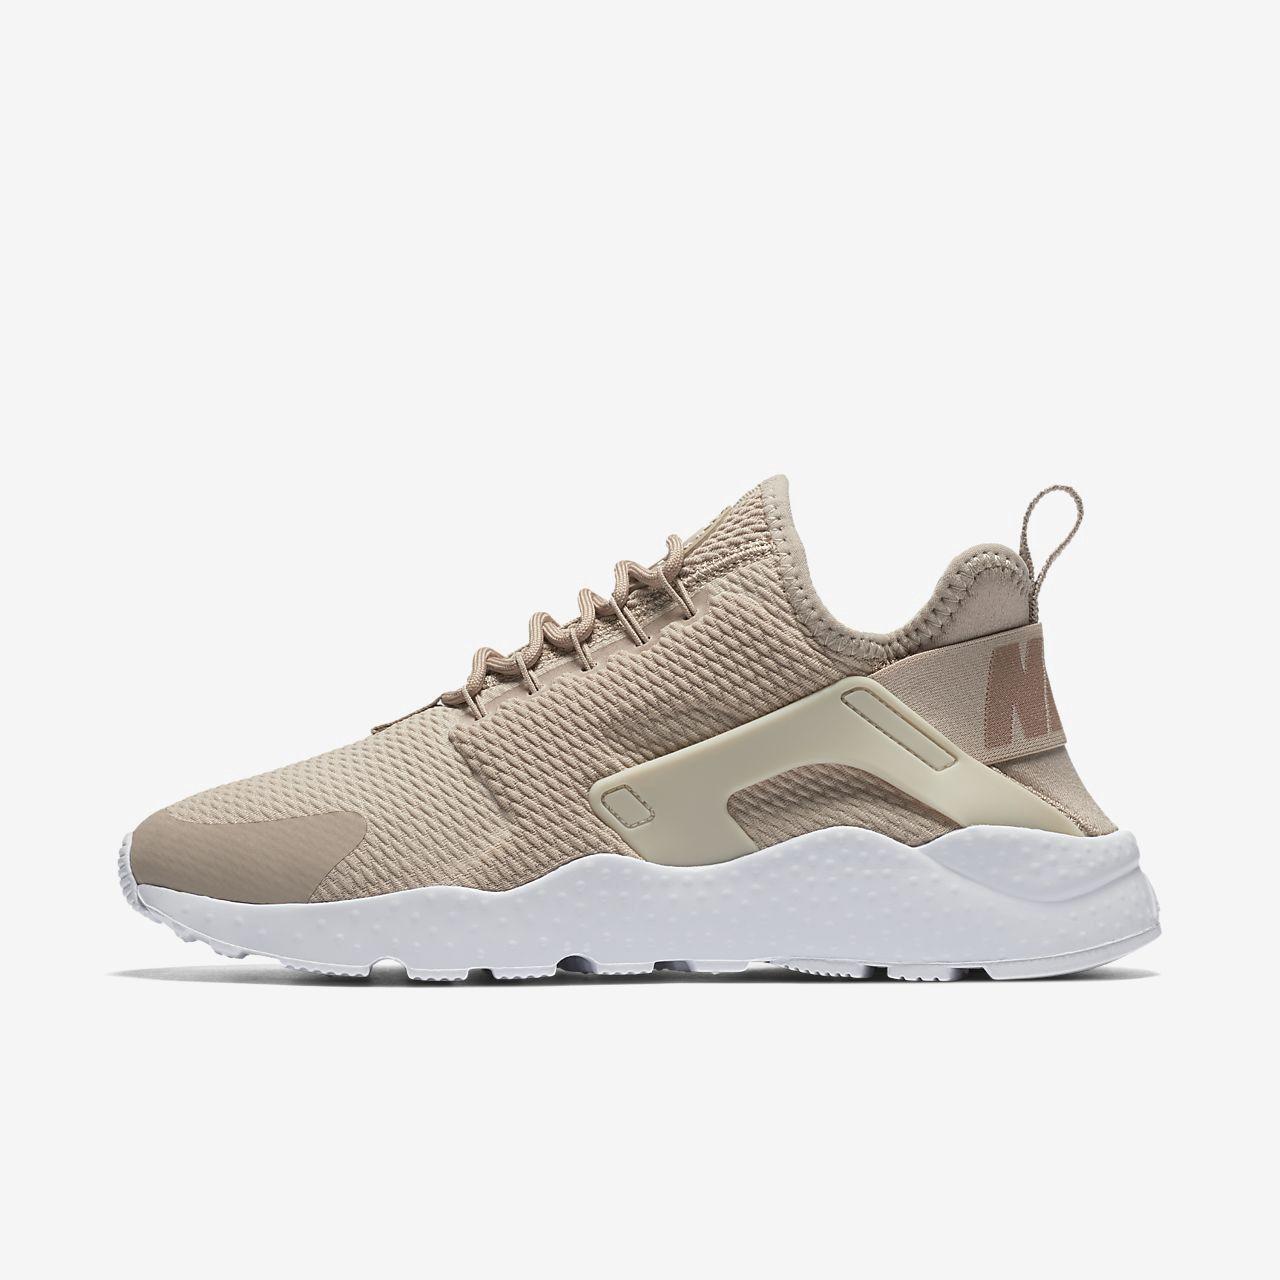 san francisco a3d64 54ff1 Nike Air Huarache Ultra Women s Shoe - 11.5